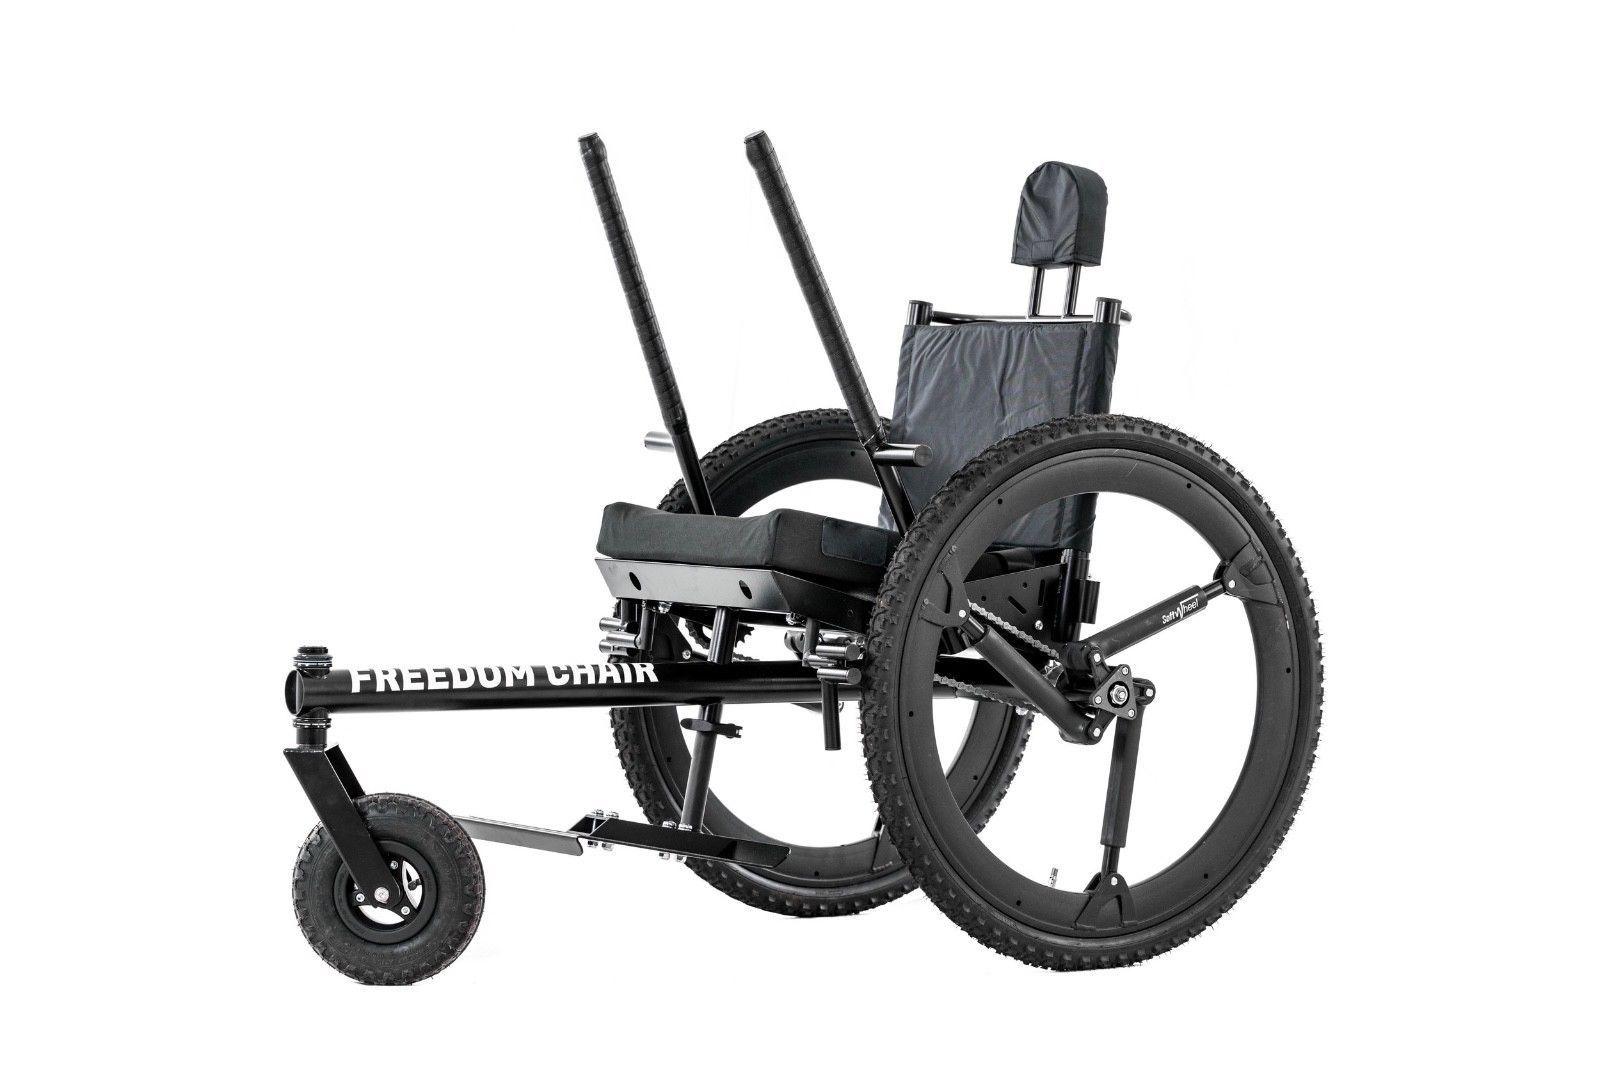 grit freedom chair canada